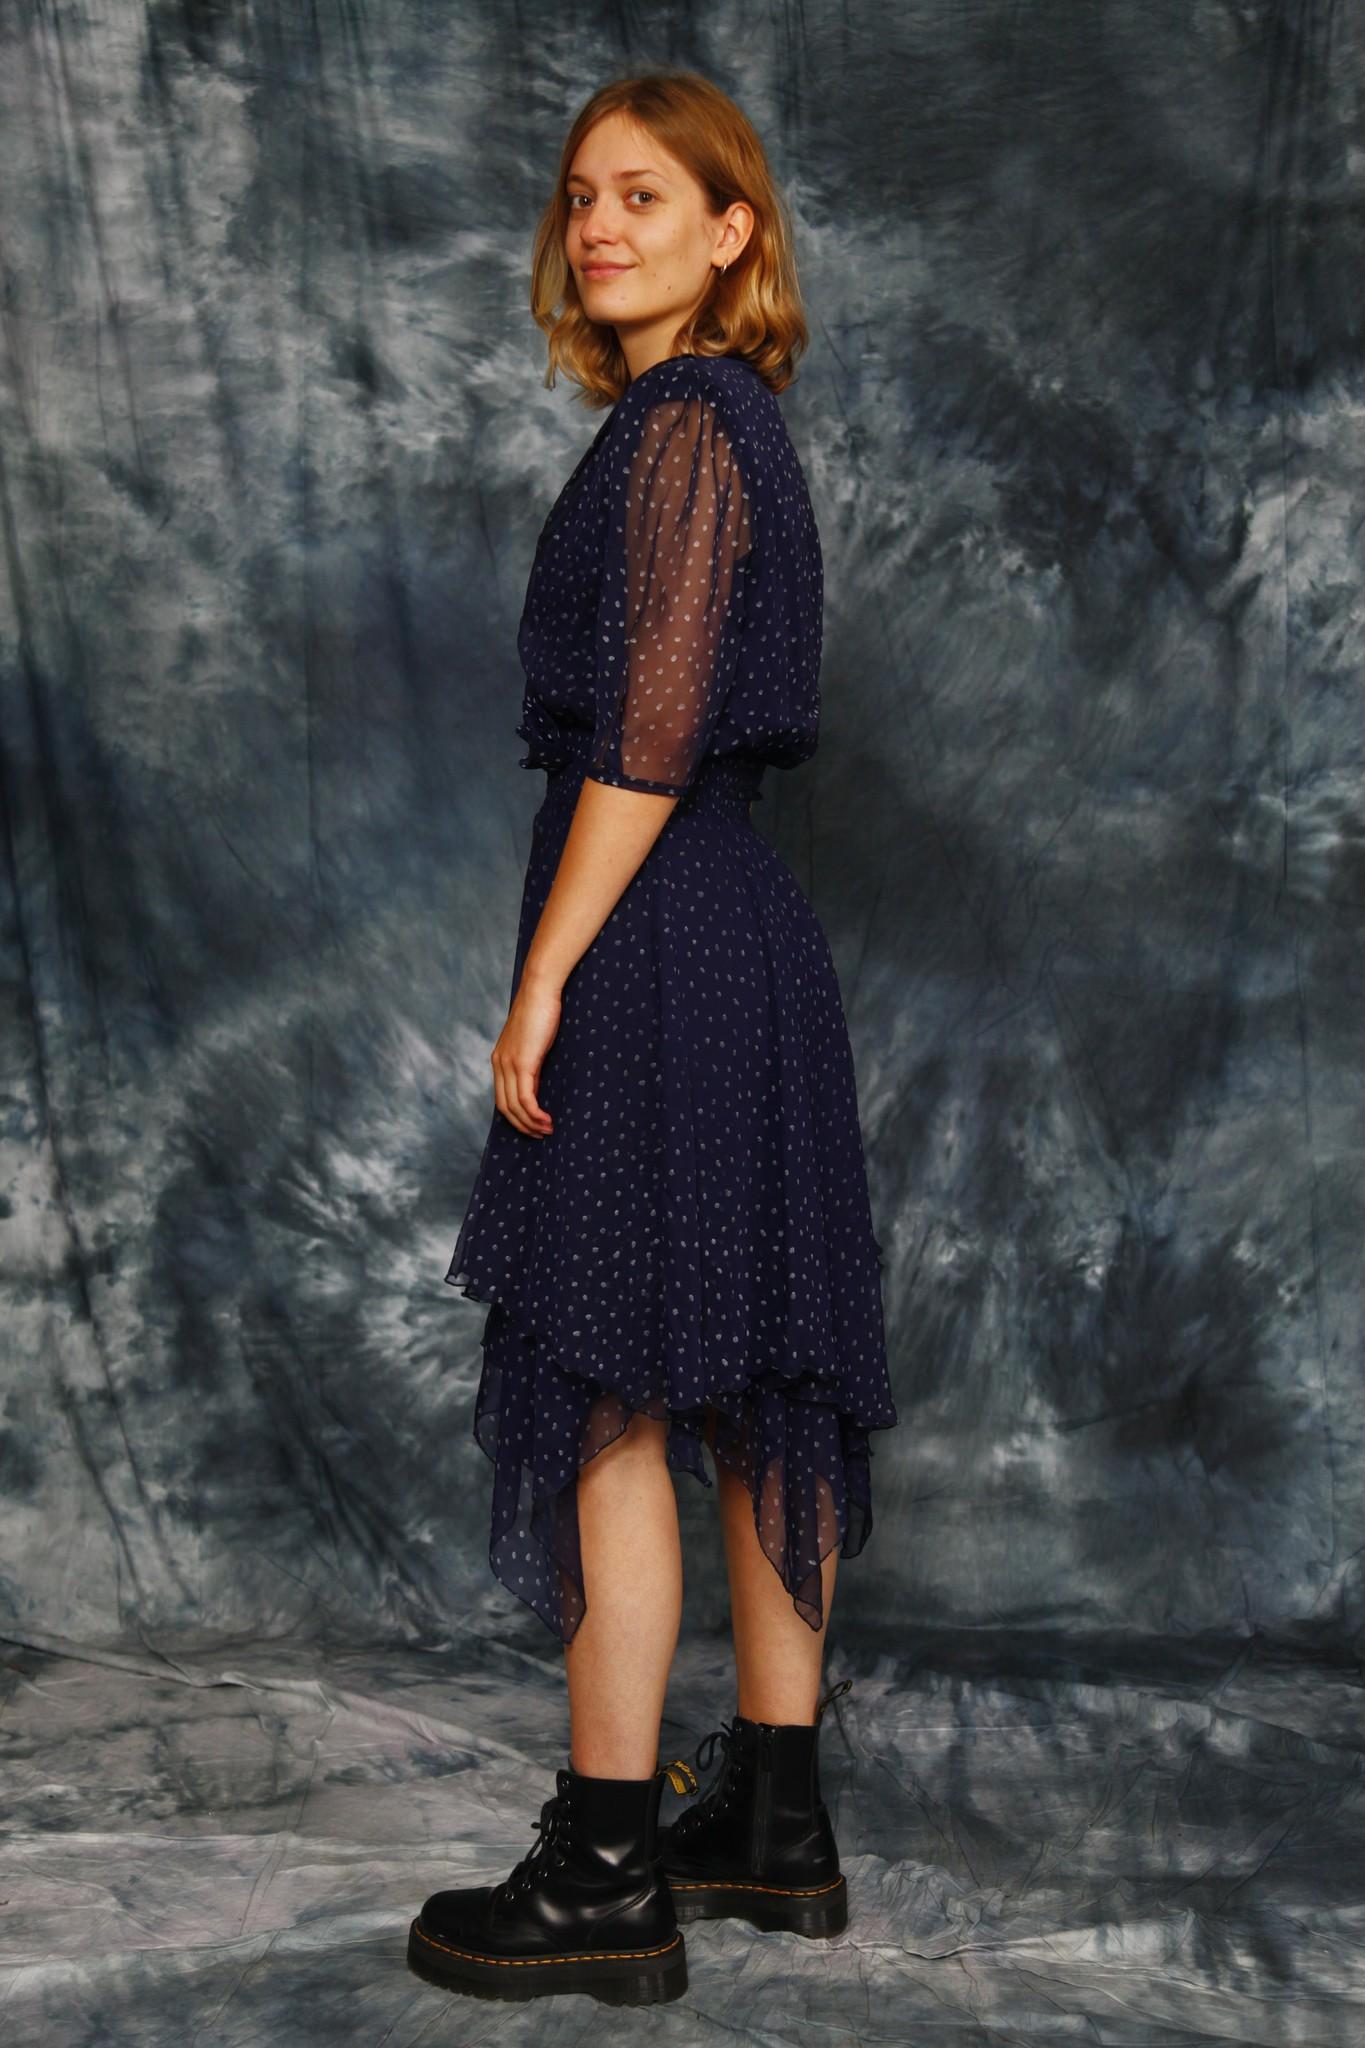 Blue 80s polka dot dress